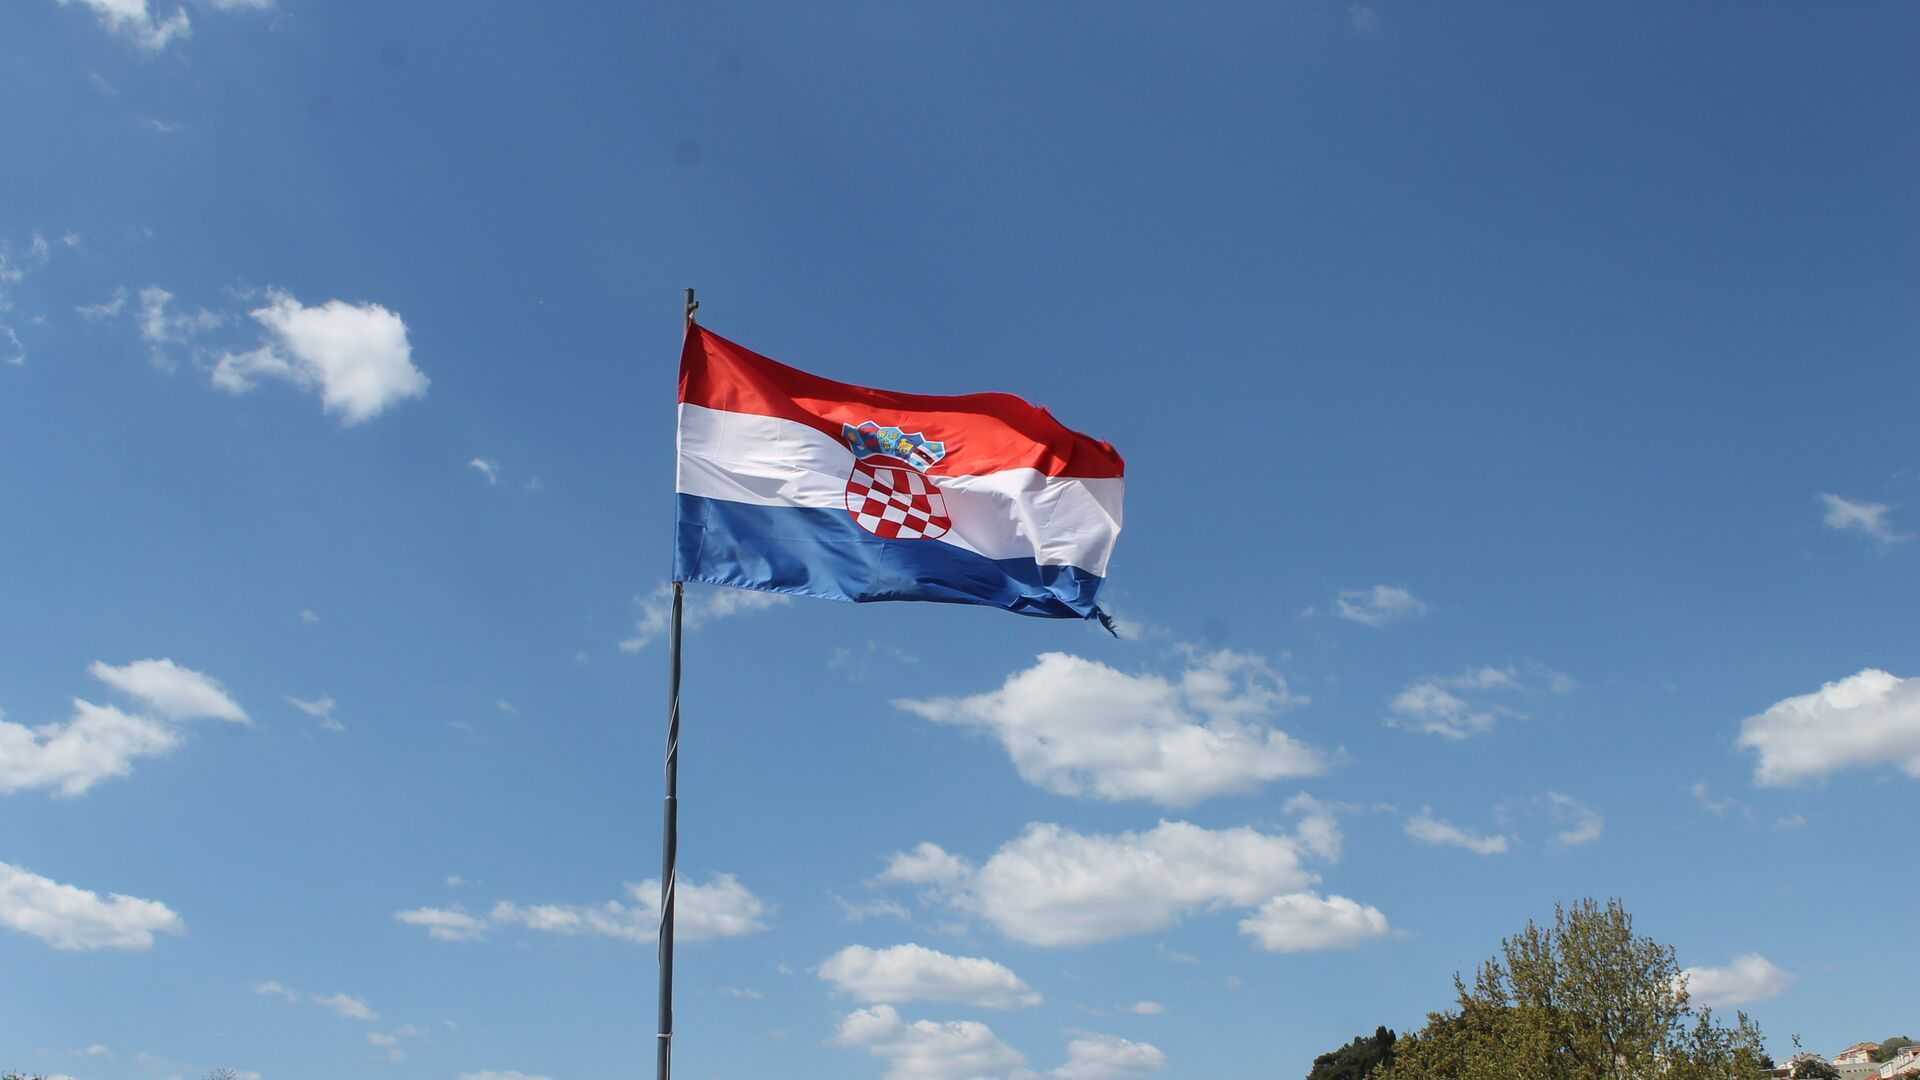 Bandera de Croacia  - Sputnik Mundo, 1920, 31.03.2021